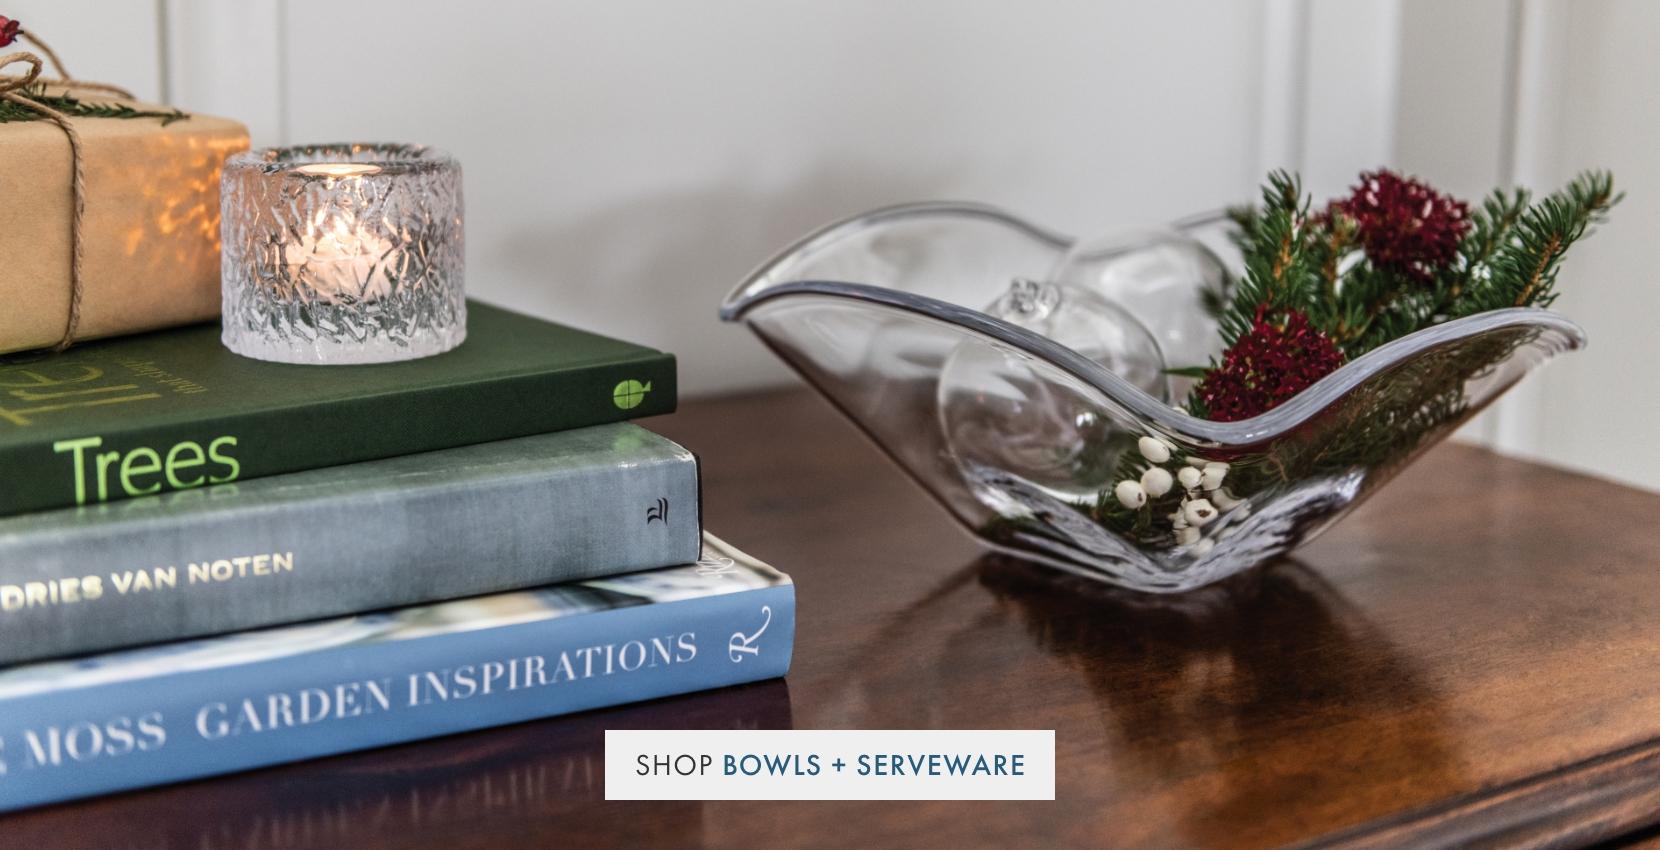 Shop Bowls + Serveware